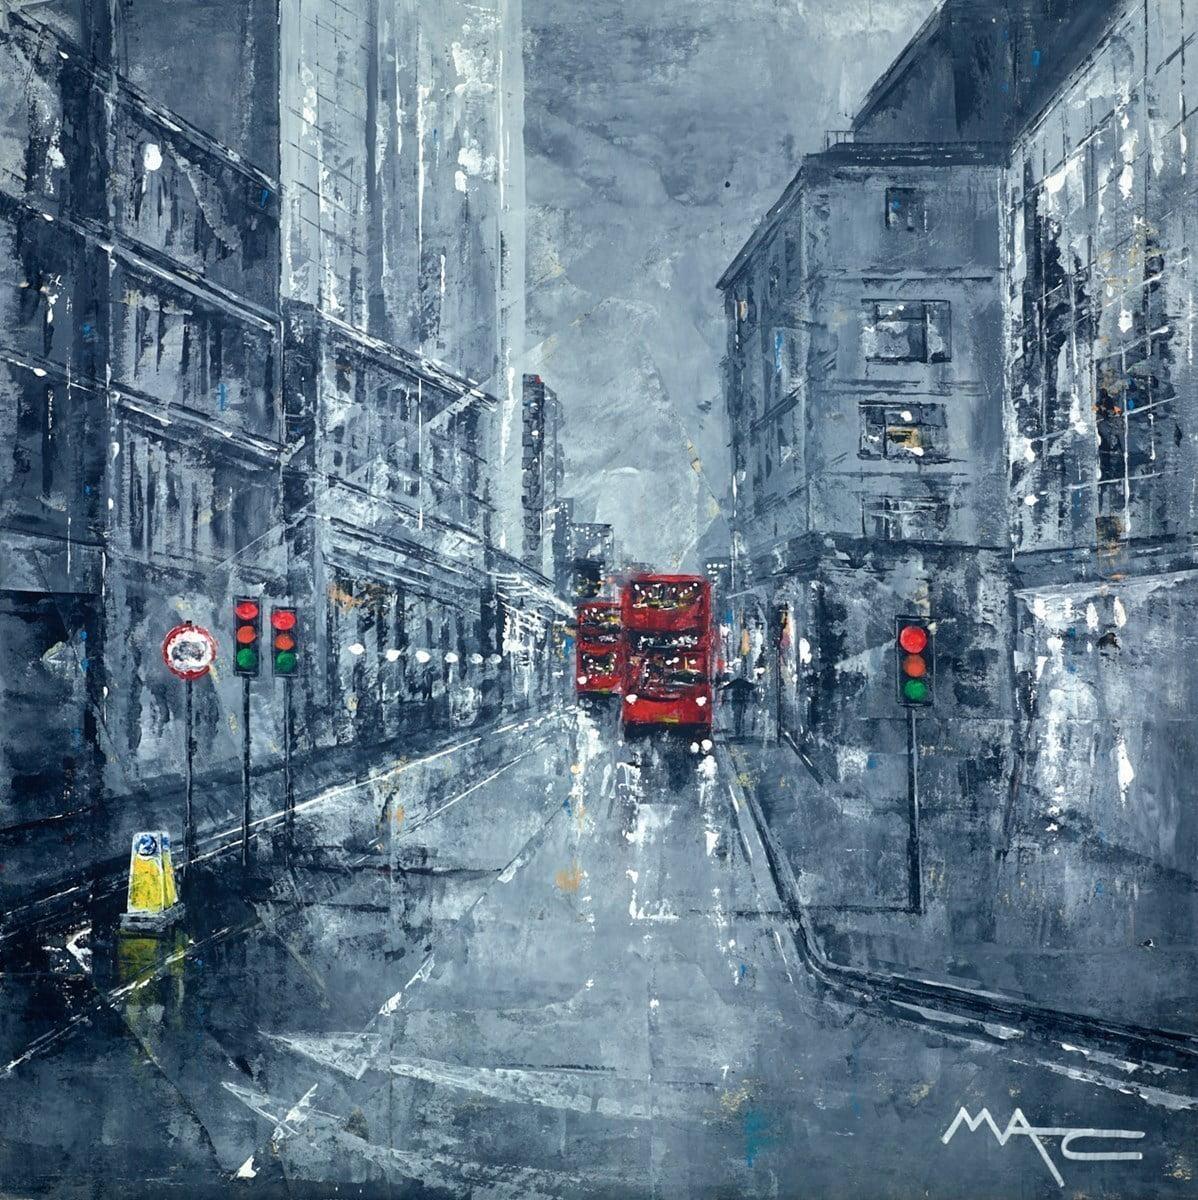 Buses in Backstreets, London ~ Mark Curryer